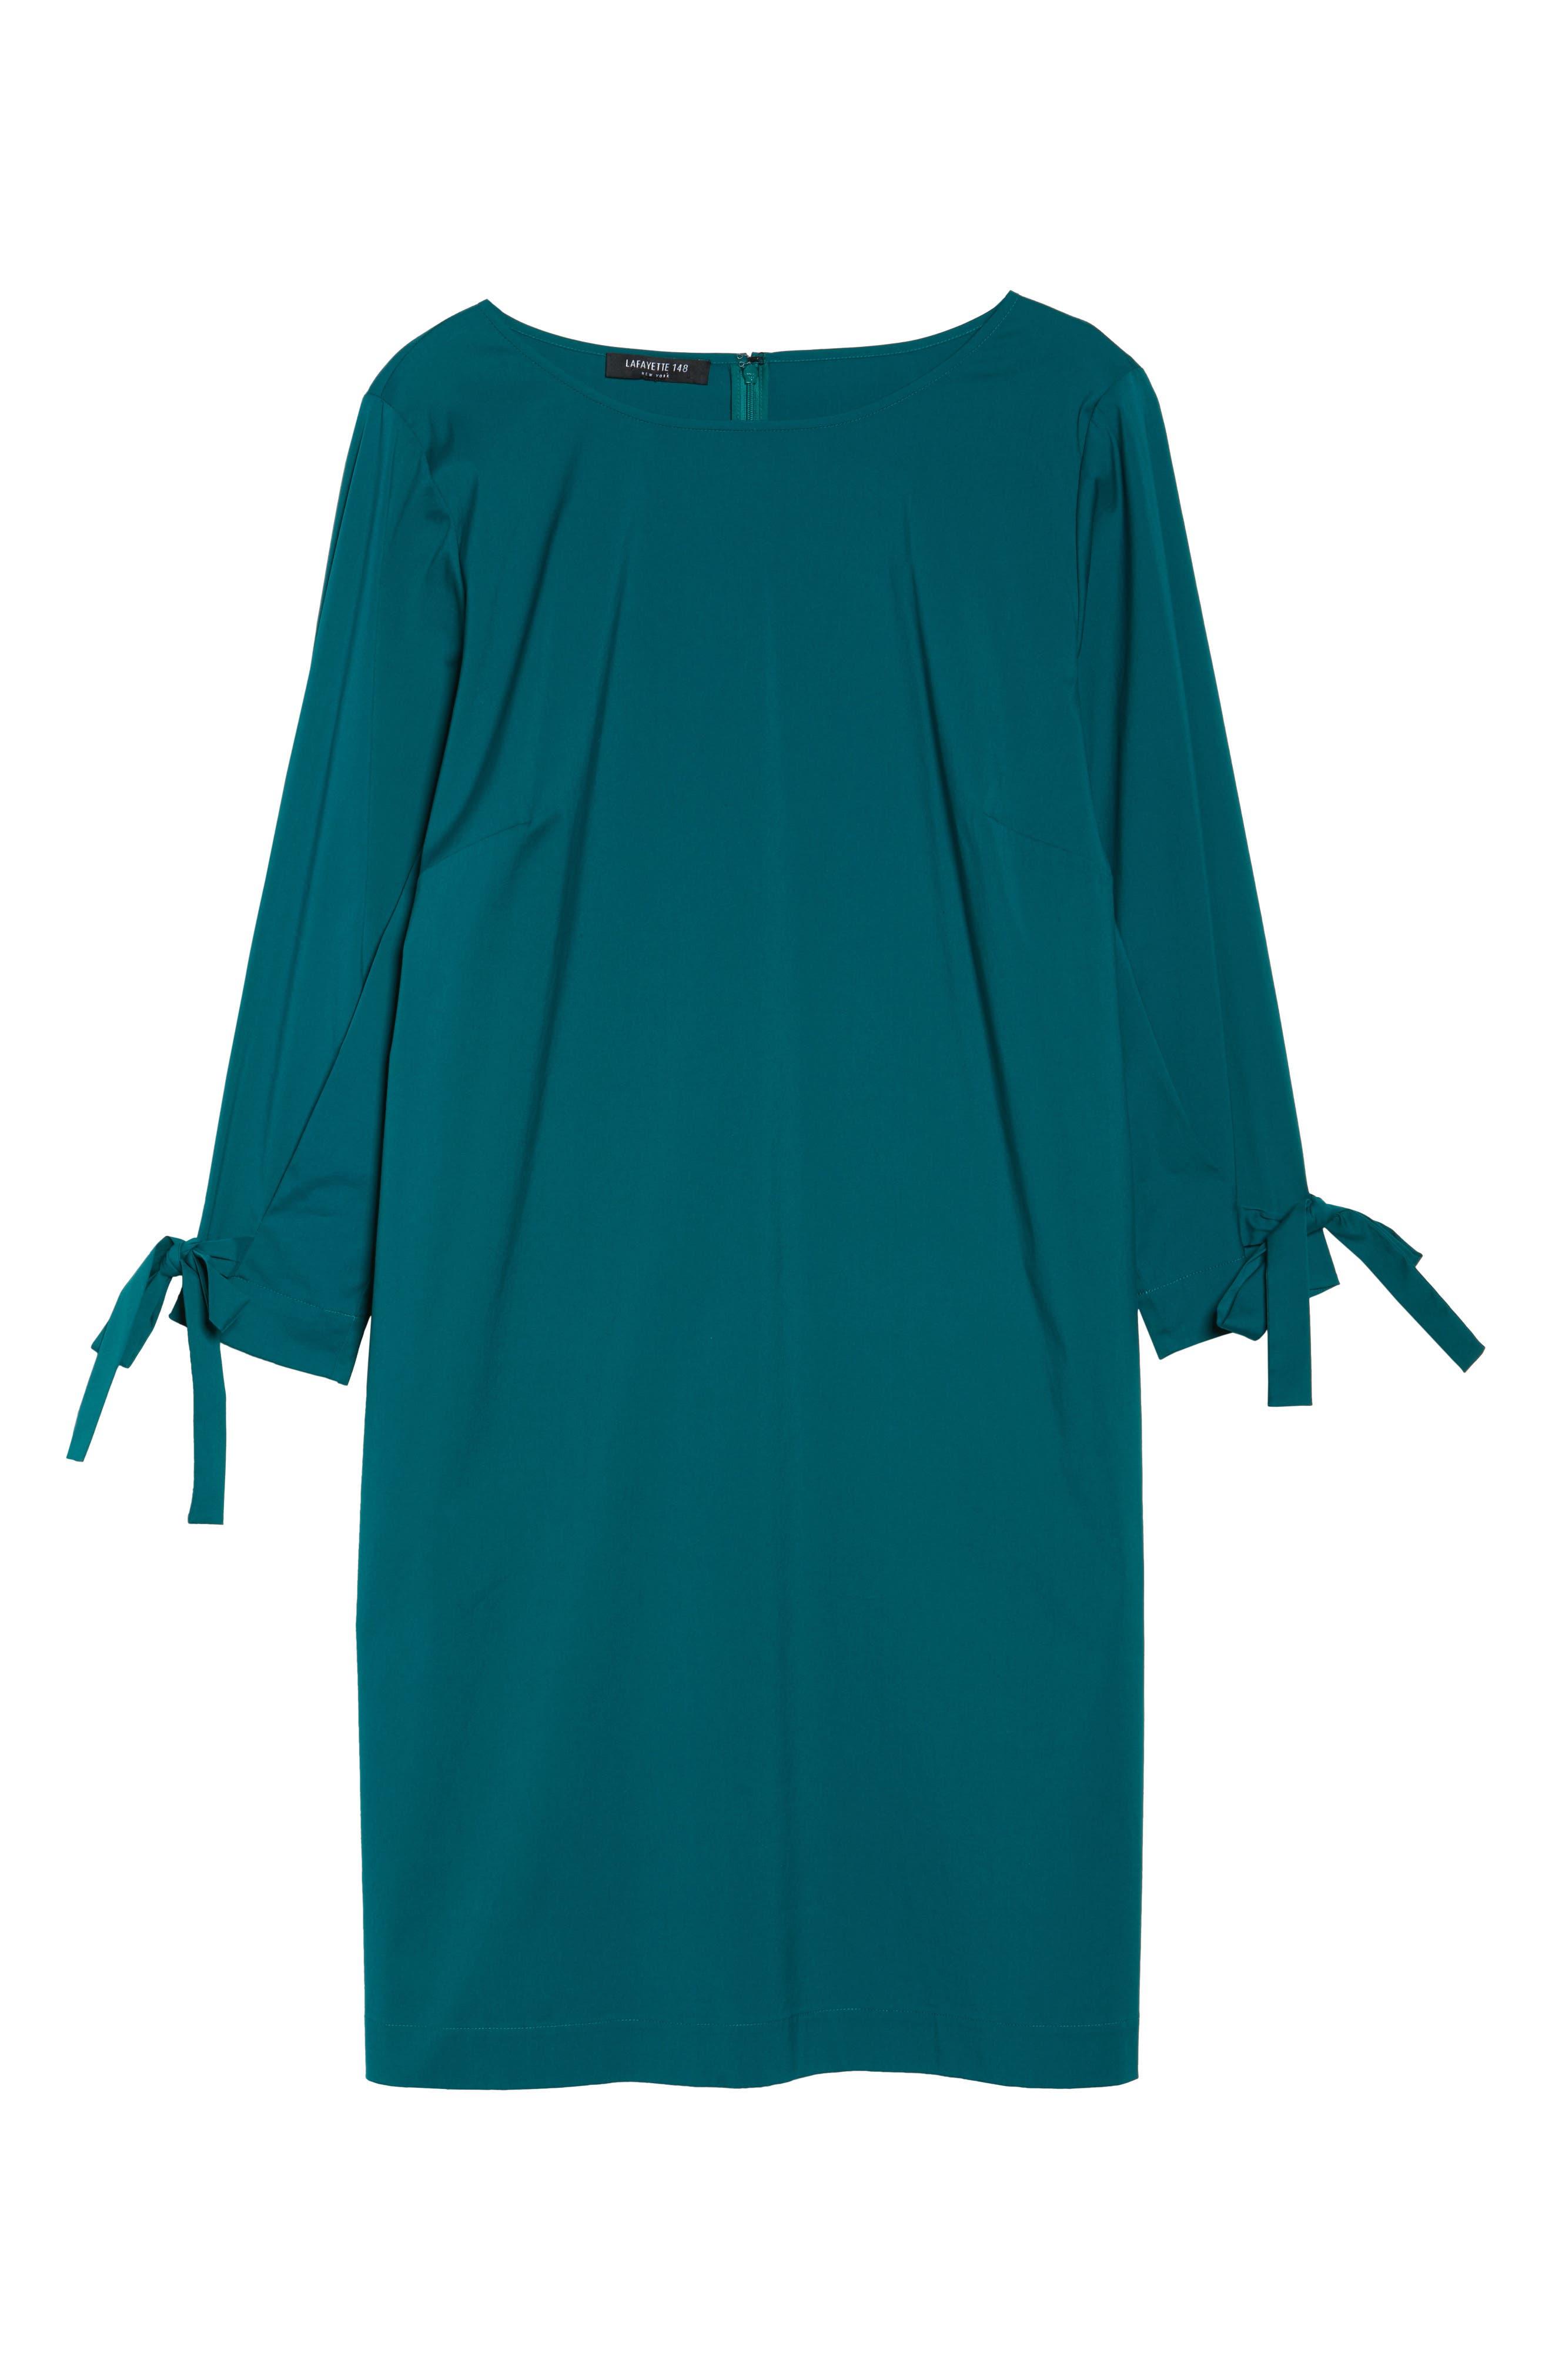 Paige Shift Dress,                             Alternate thumbnail 6, color,                             432